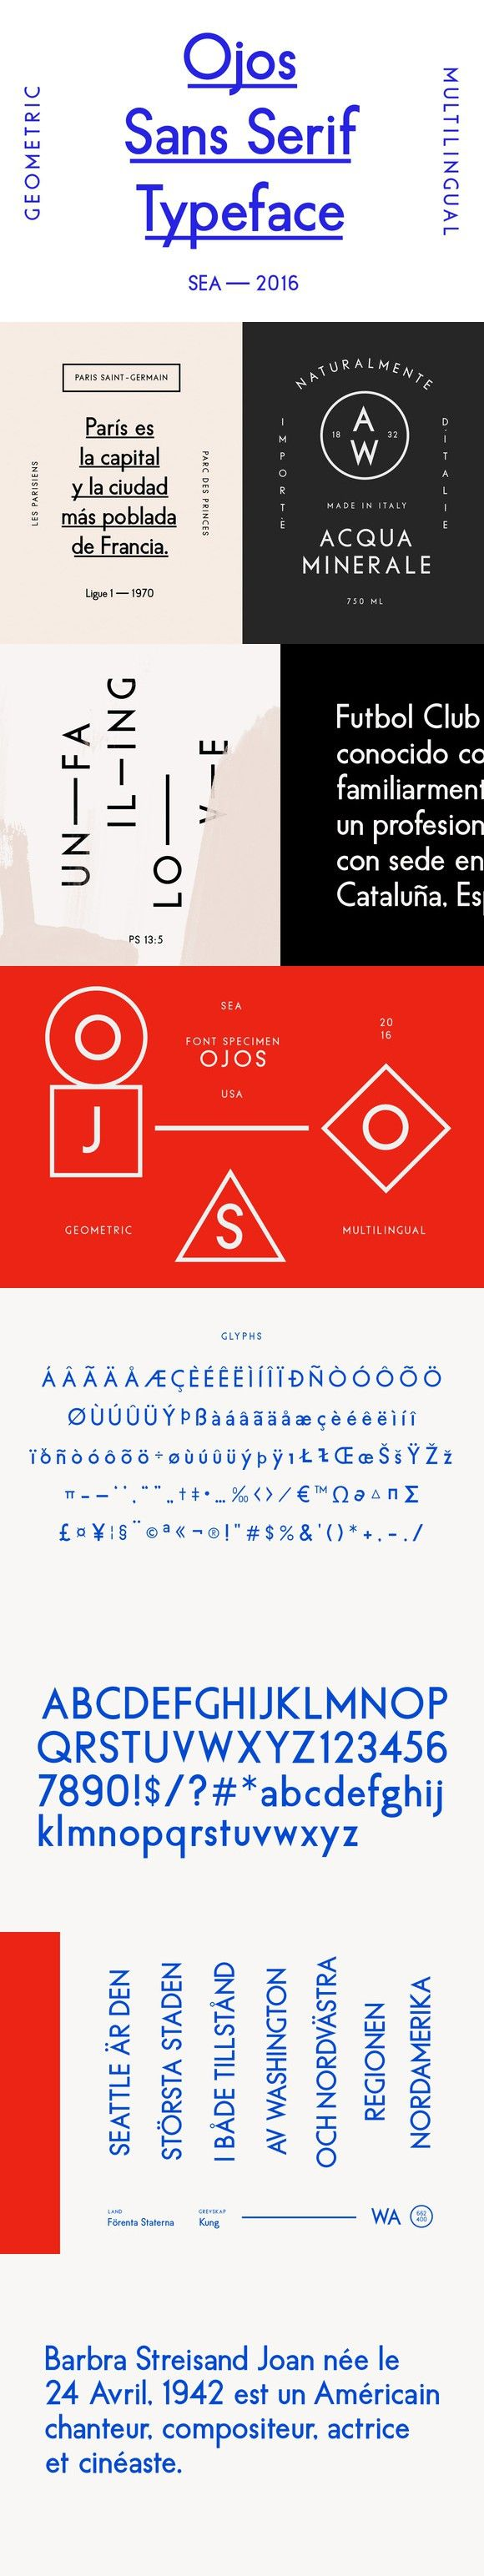 Ojos Sans Serif Font. Sans Serif Fonts. $29.00